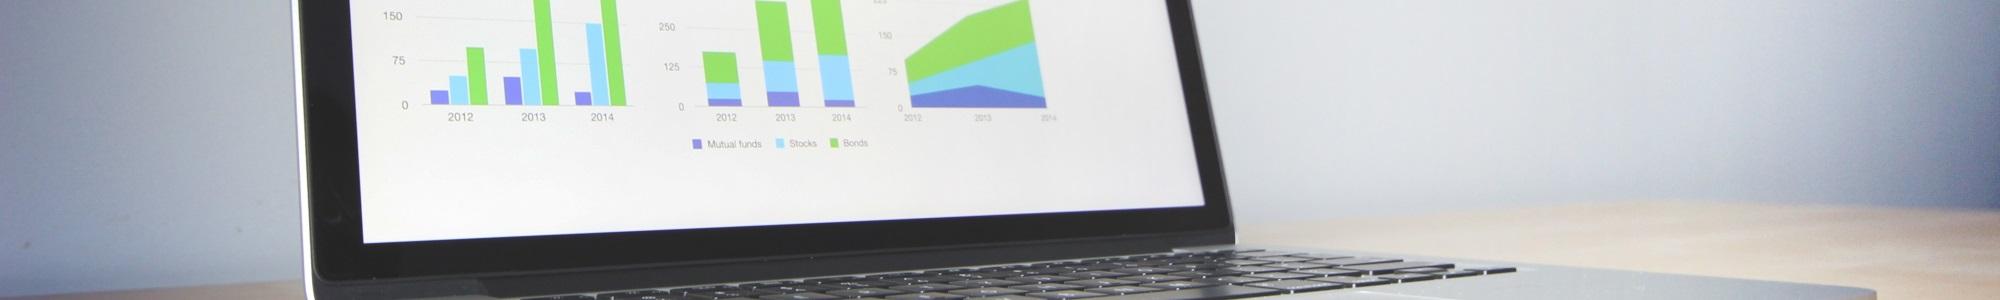 free online financial portfolio review summit investment management